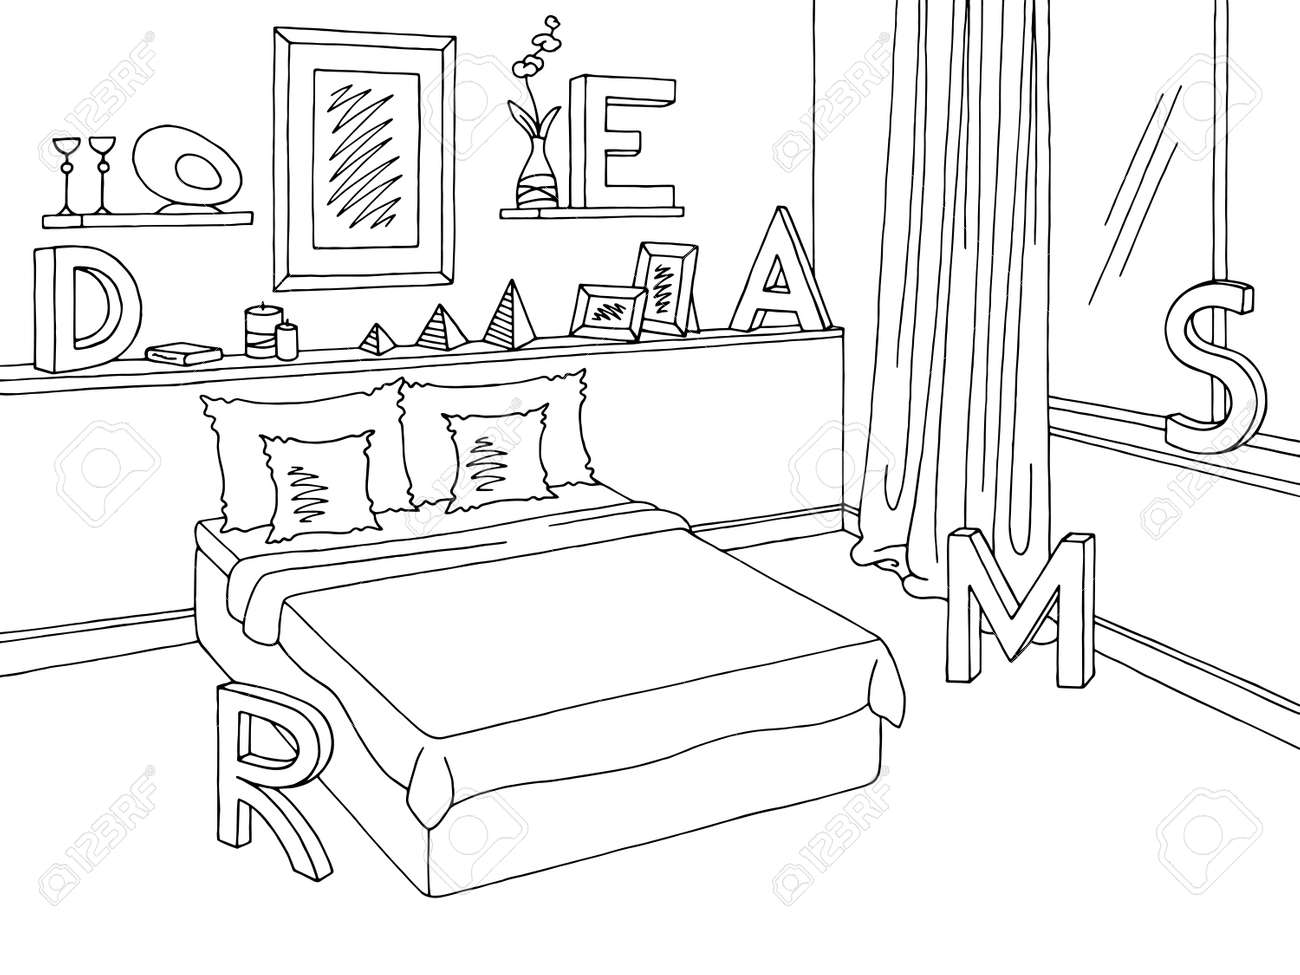 Bedroom Graphic Black White Home Interior Sketch Illustration